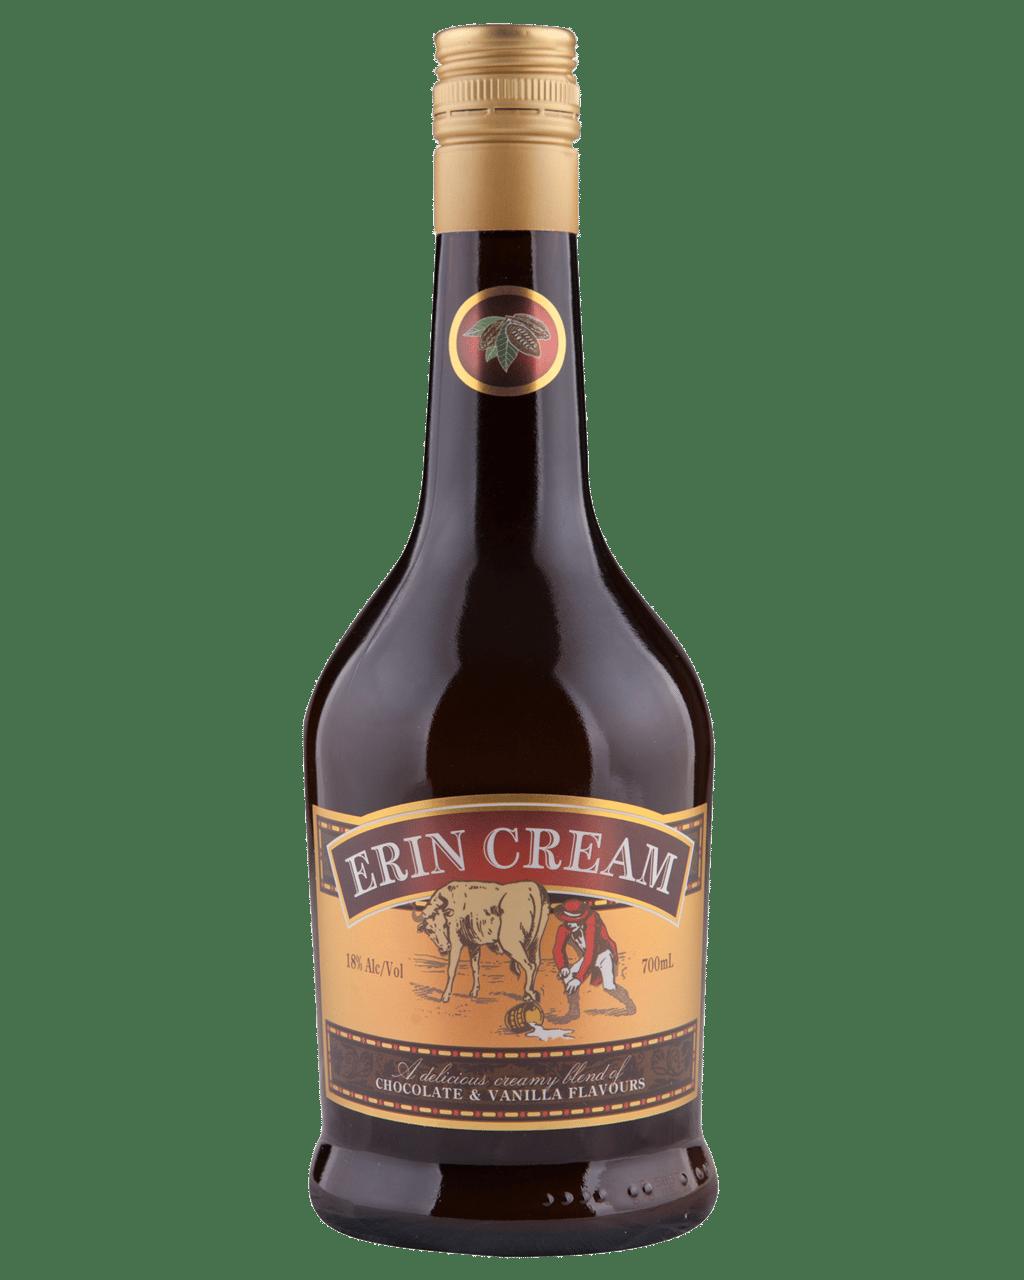 new style c0417 9c373 Buy Erin Cream Cream Liqueur 700mL | Dan Murphy's